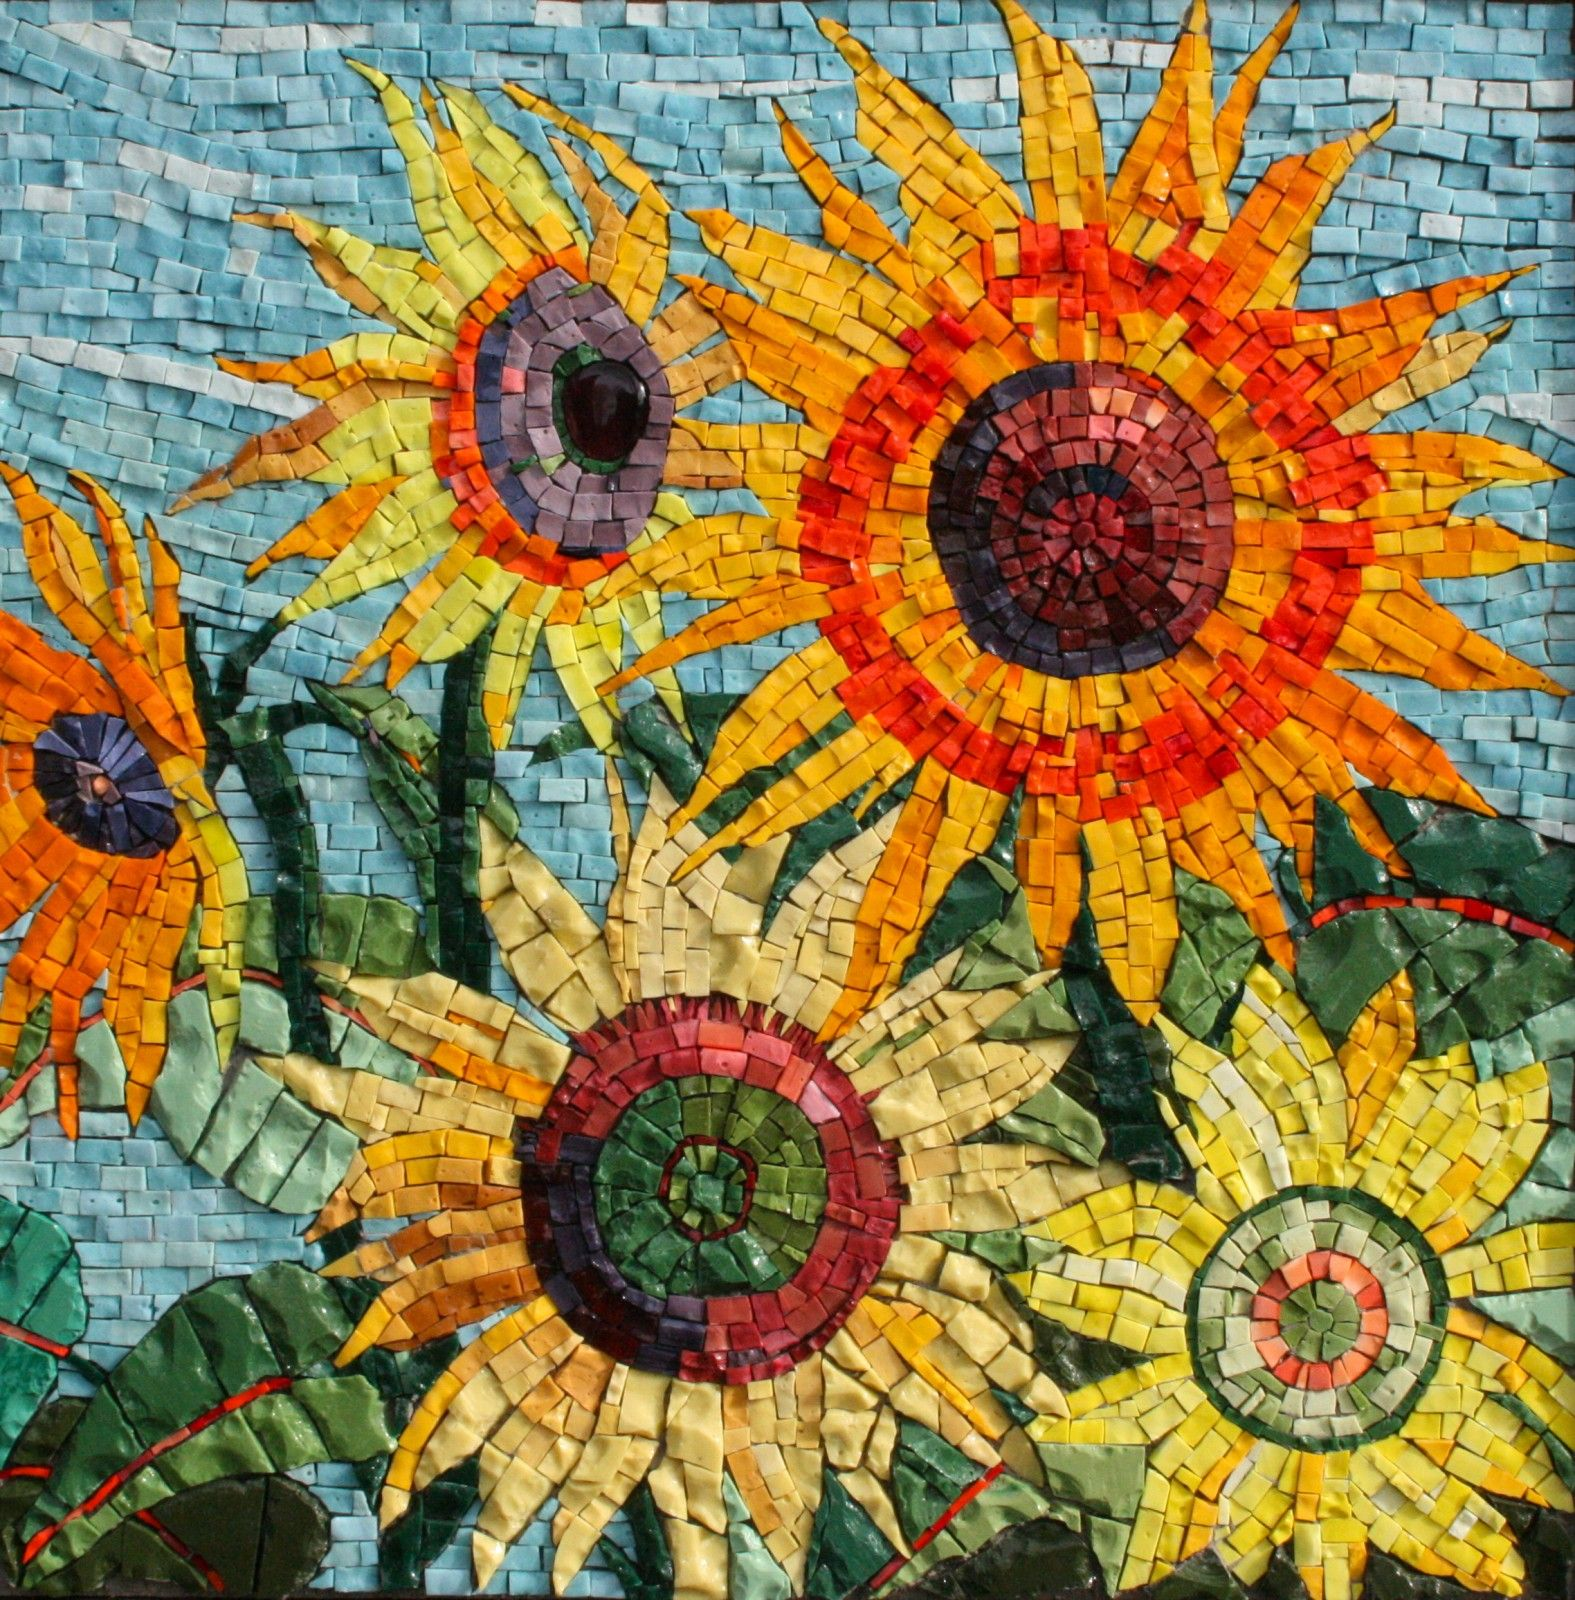 Sun flowers pamela stratton mosaic love pinterest for Mosaic art pictures